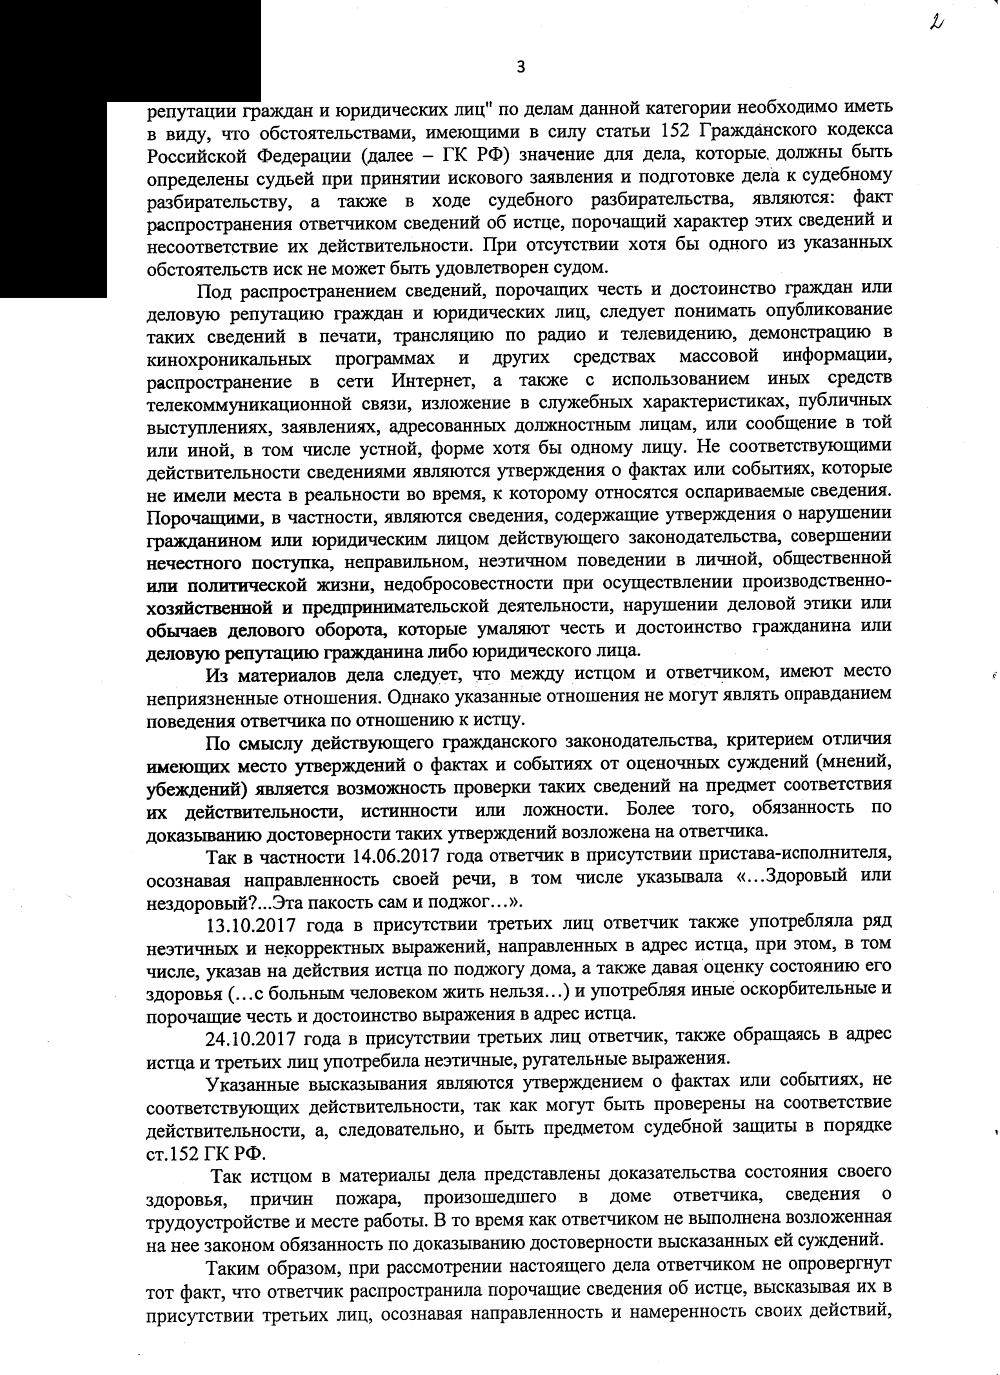 https://sontgranit.ru/forum/img/sokol/20180406-определениеВС-3.png